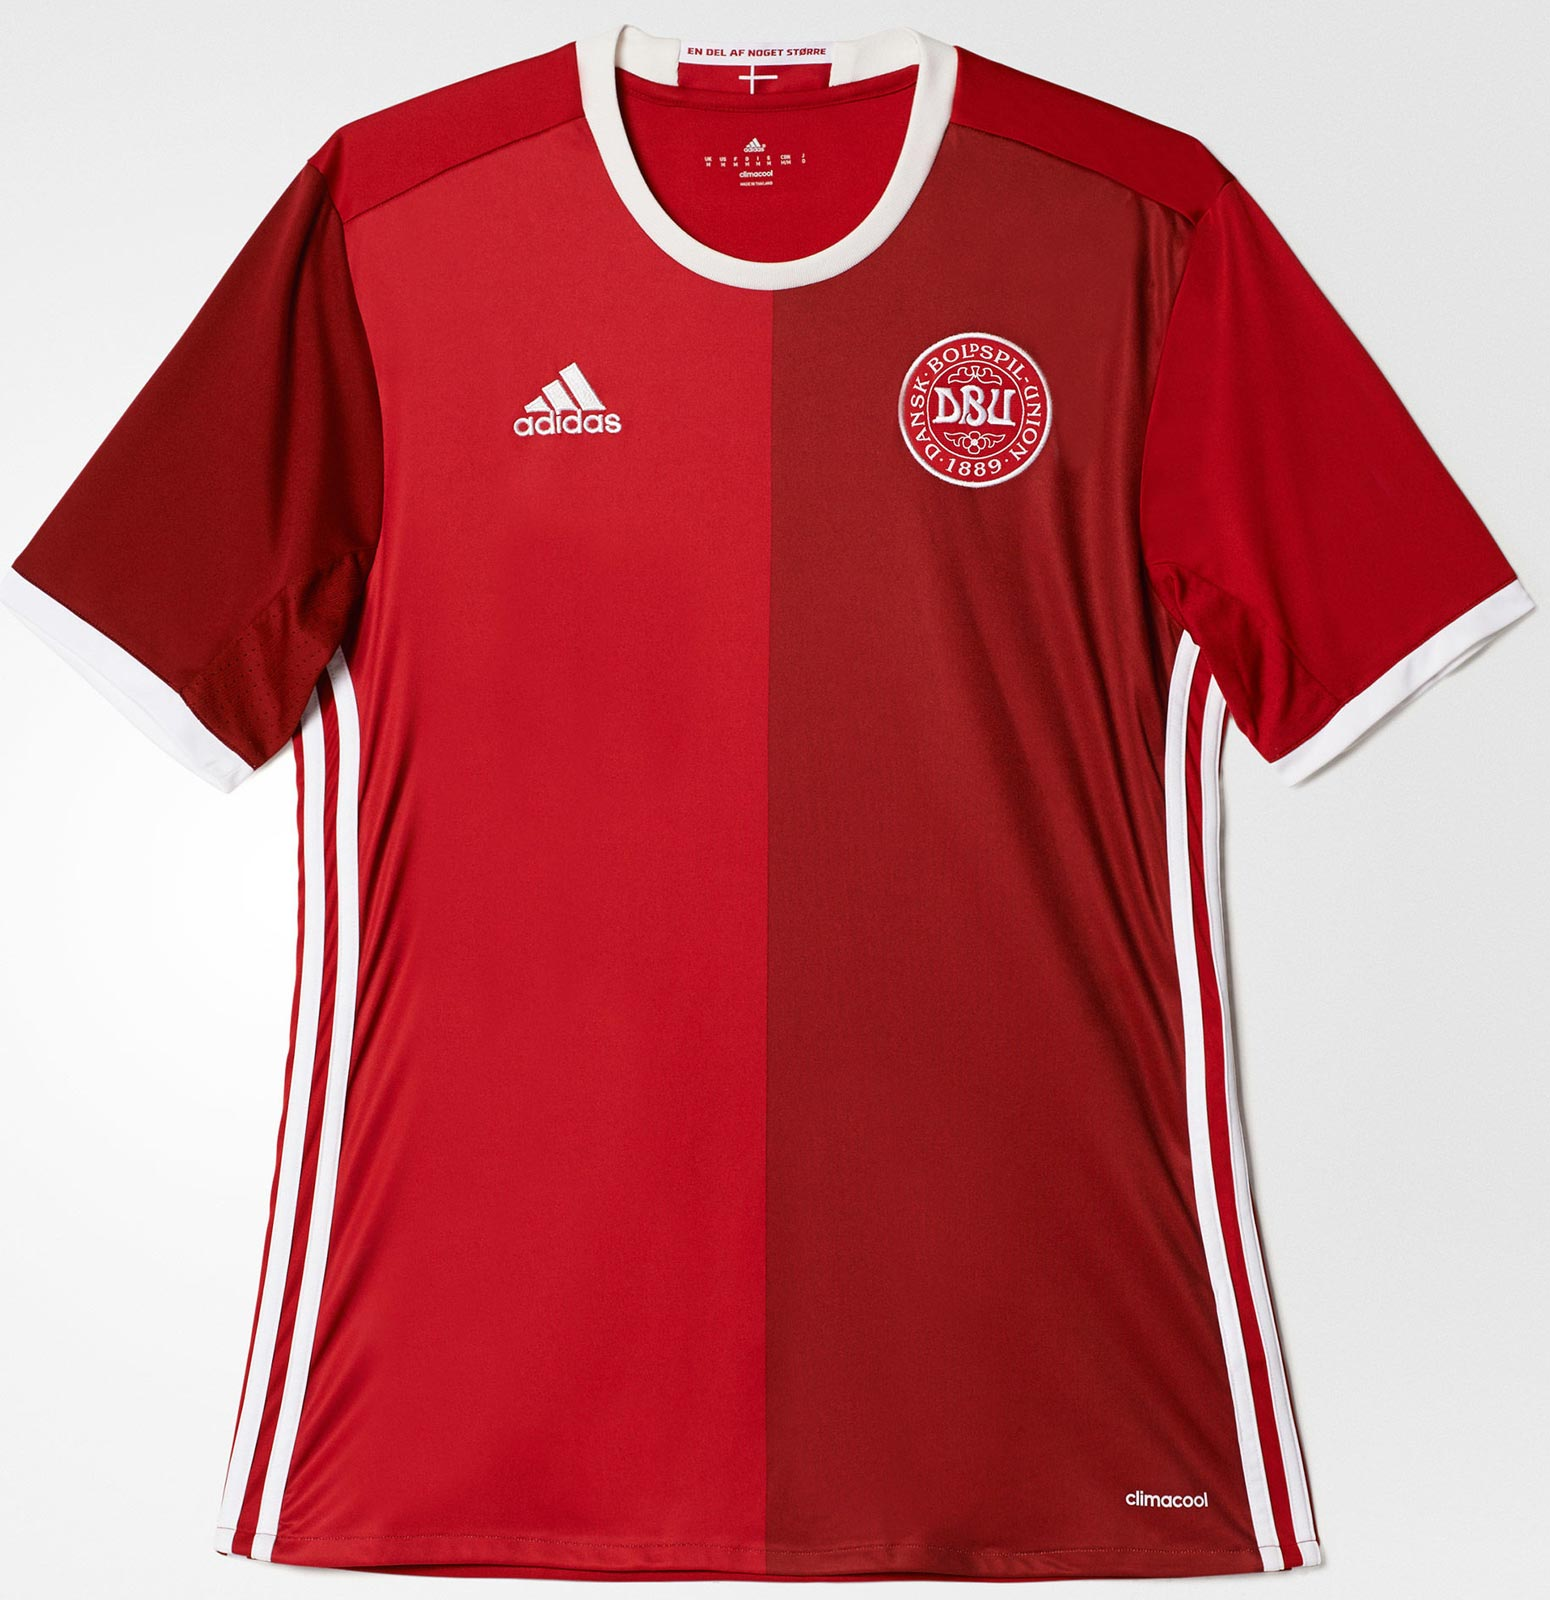 94653f359d Adidas divulga nova camisa titular da Dinamarca - Show de Camisas